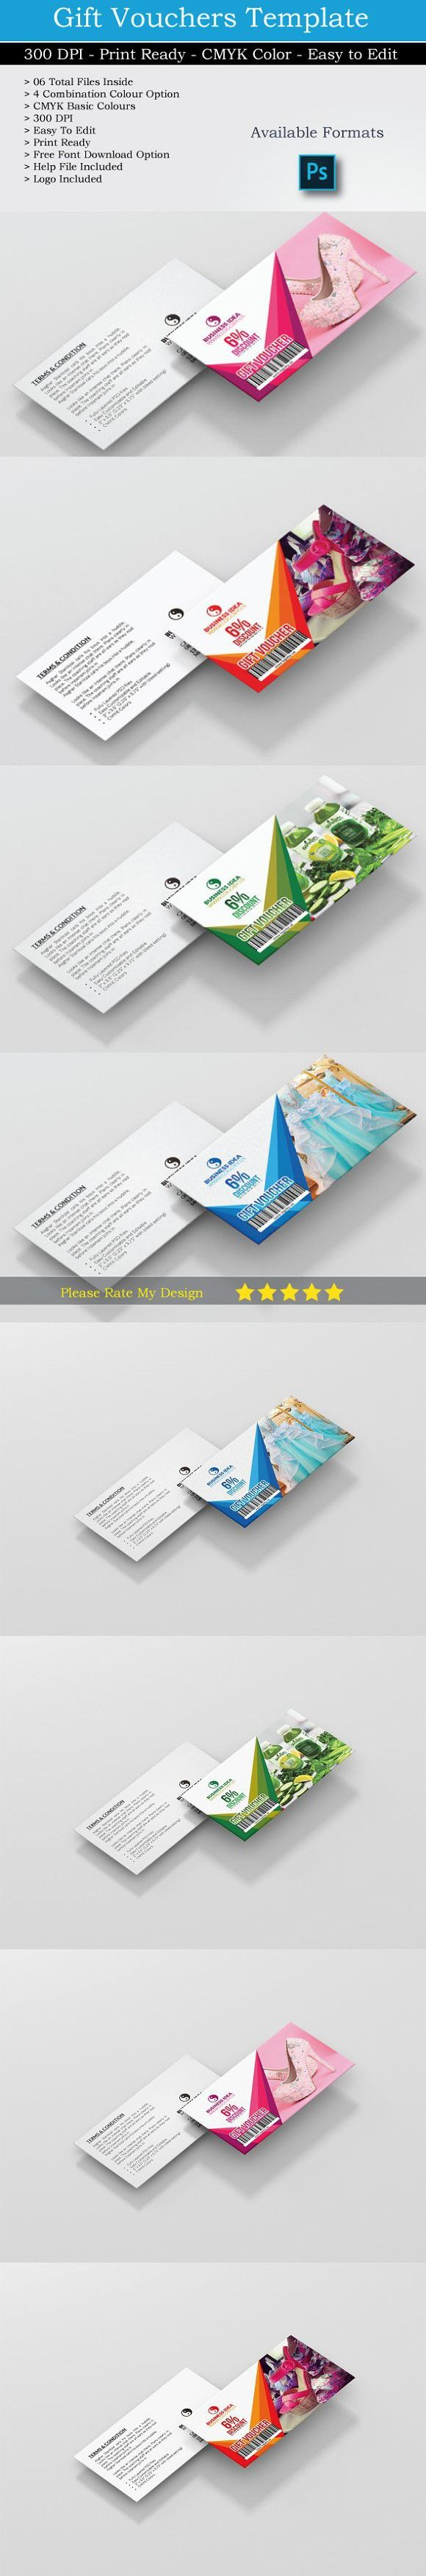 Gift Voucher Card Psd Updated Card Templates Gift Card Template